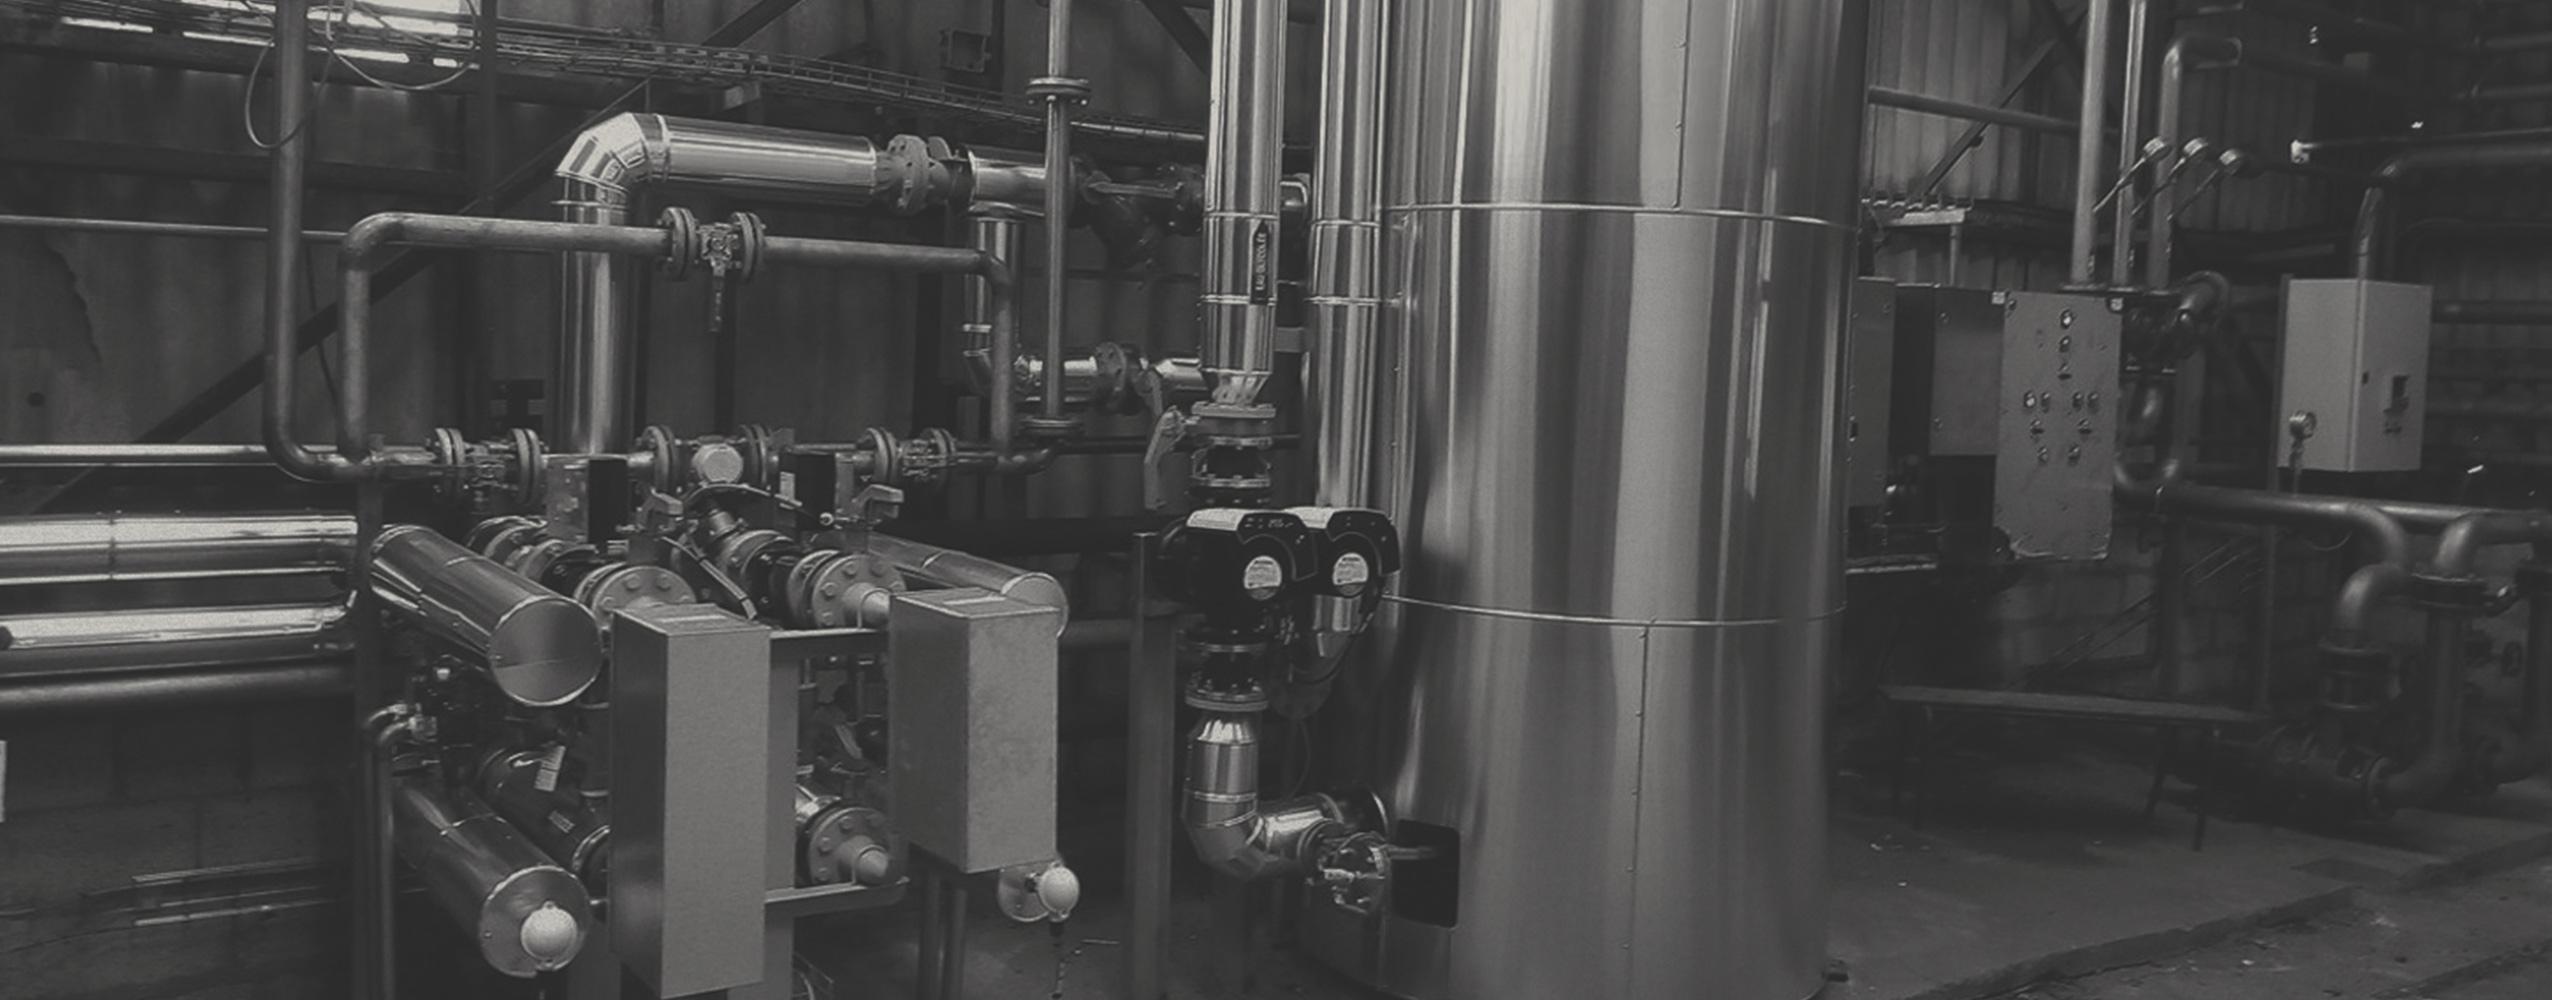 chaudronnerie-tuyauterie industrielle